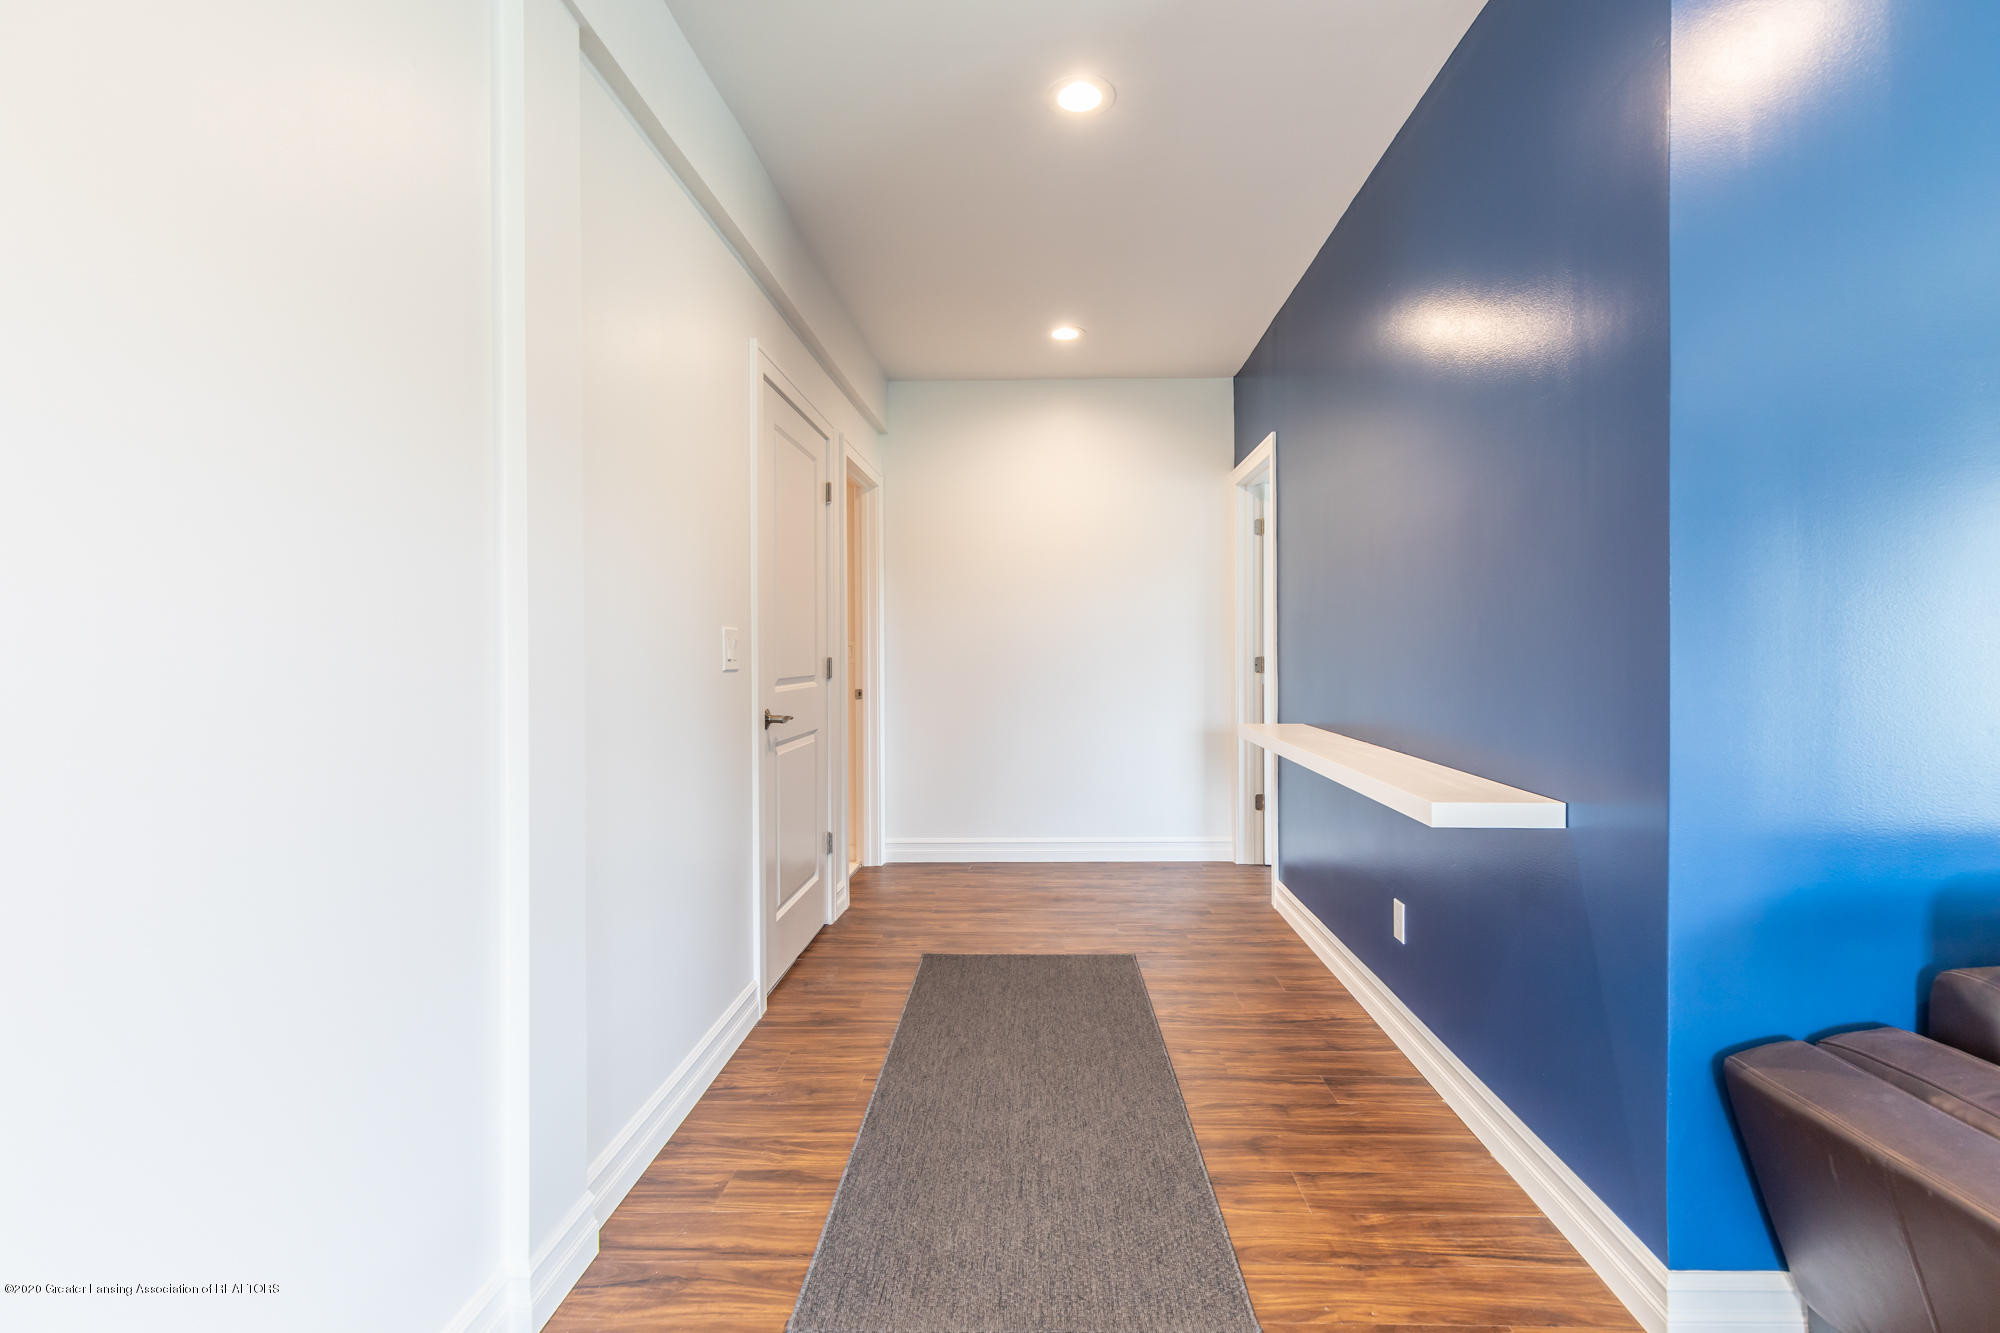 4020 Hagadorn Rd - Basement Hallway - 37